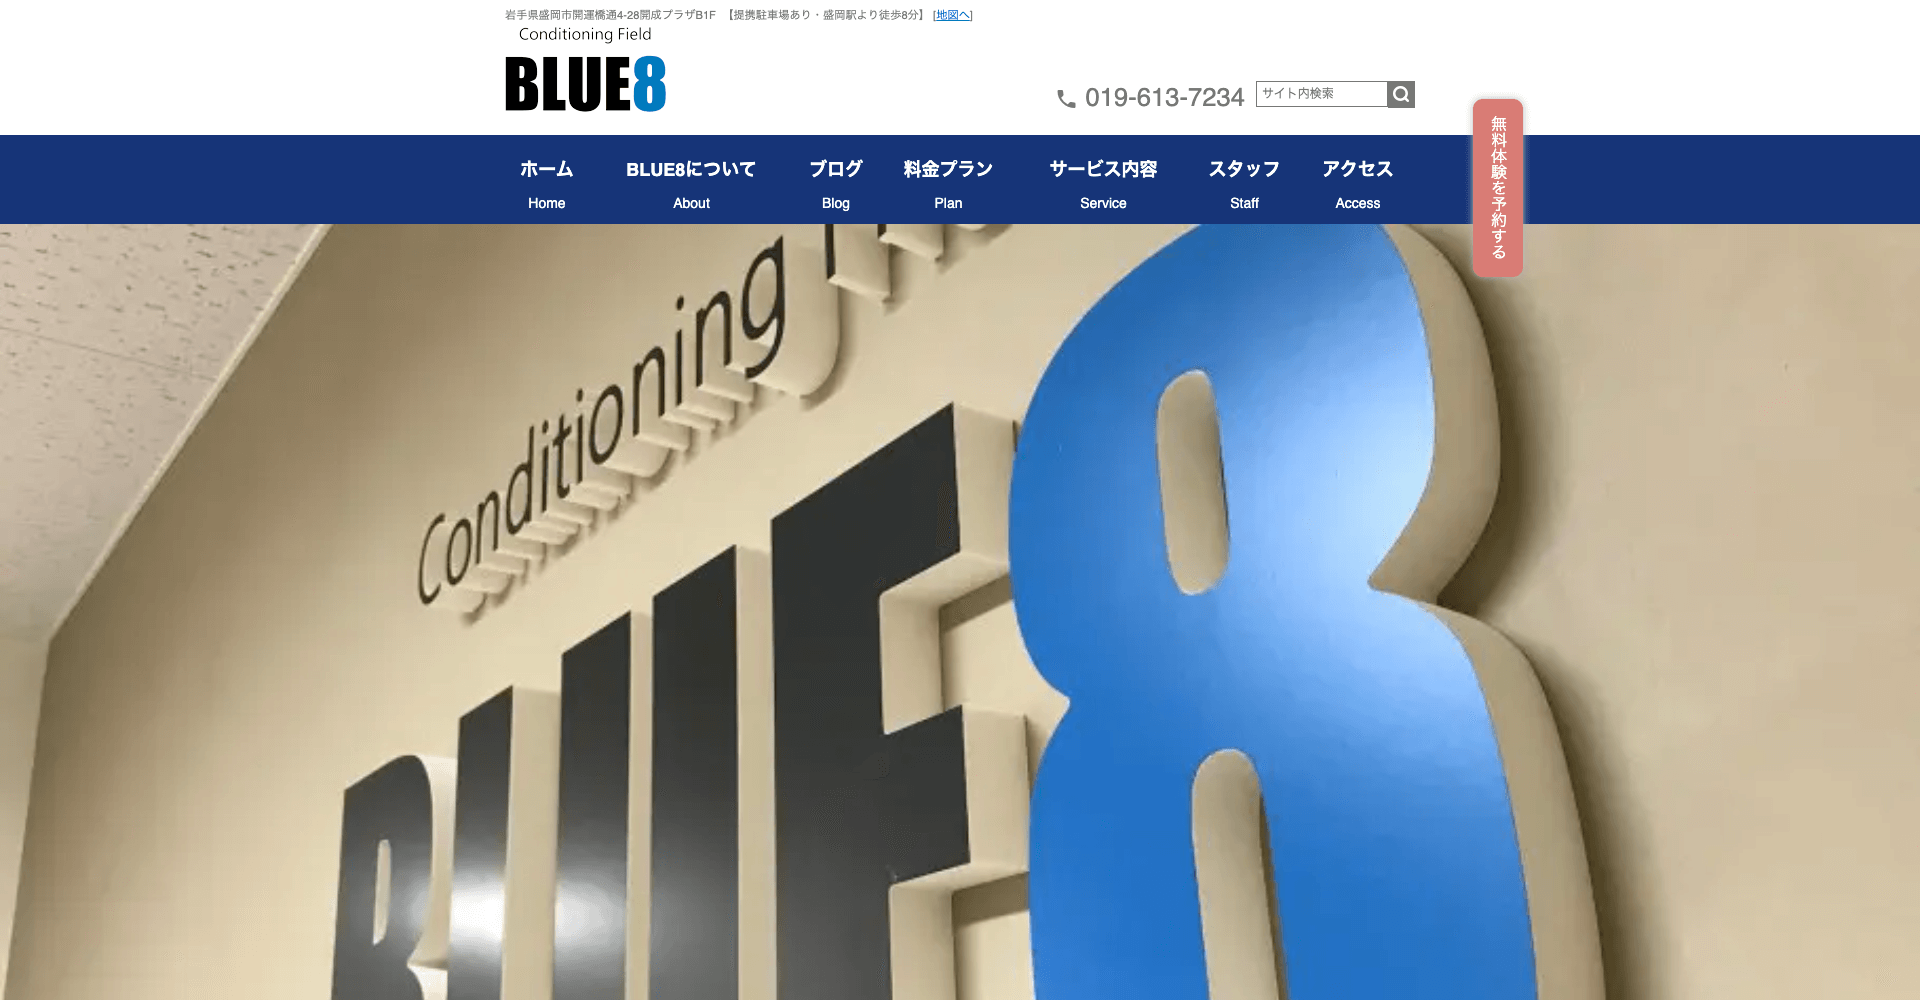 ConditioningFieldBLUE8(ブルーエイト)